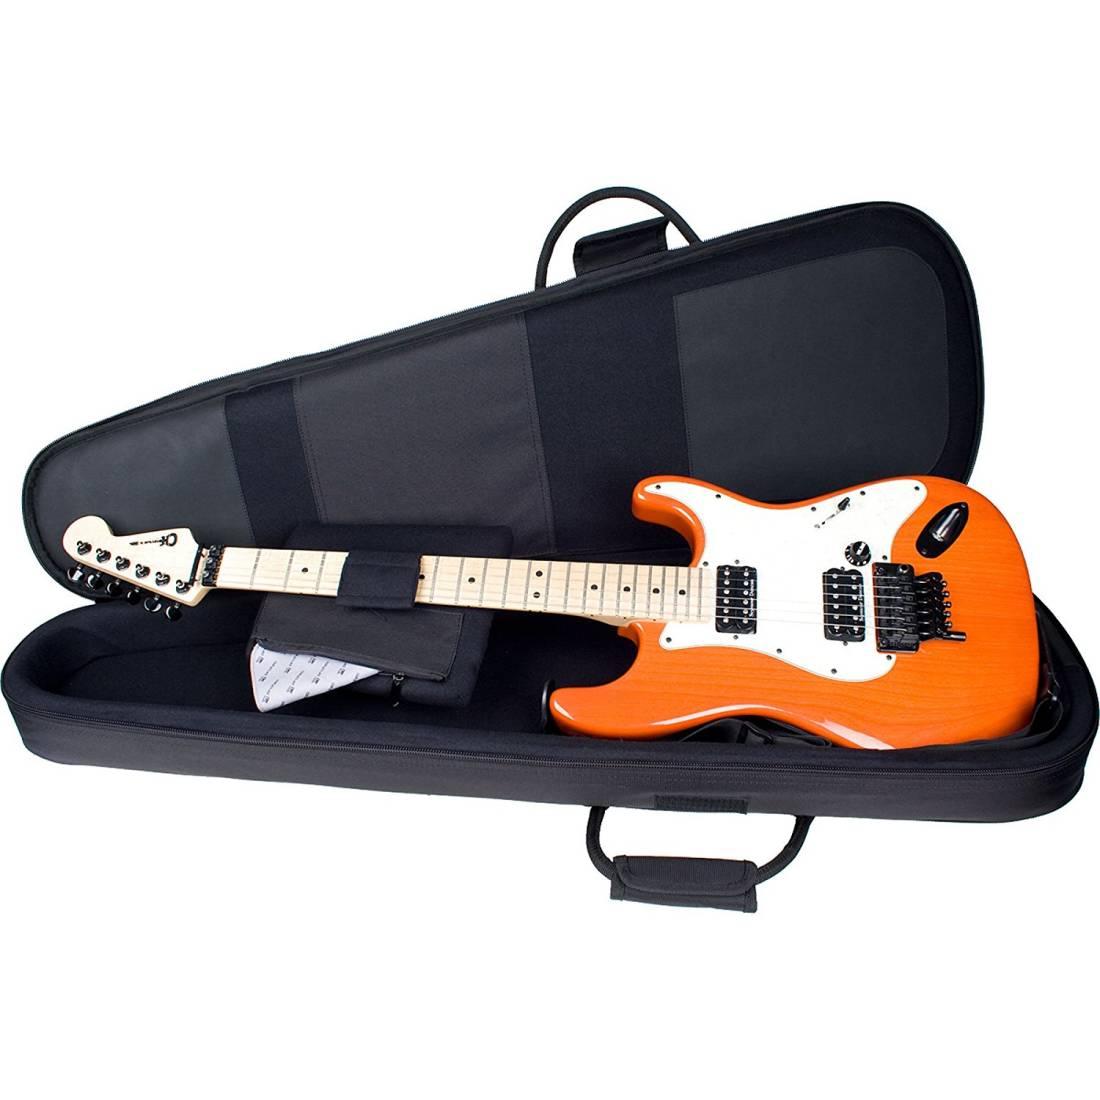 protec contego electric guitar bag black long mcquade musical instruments. Black Bedroom Furniture Sets. Home Design Ideas